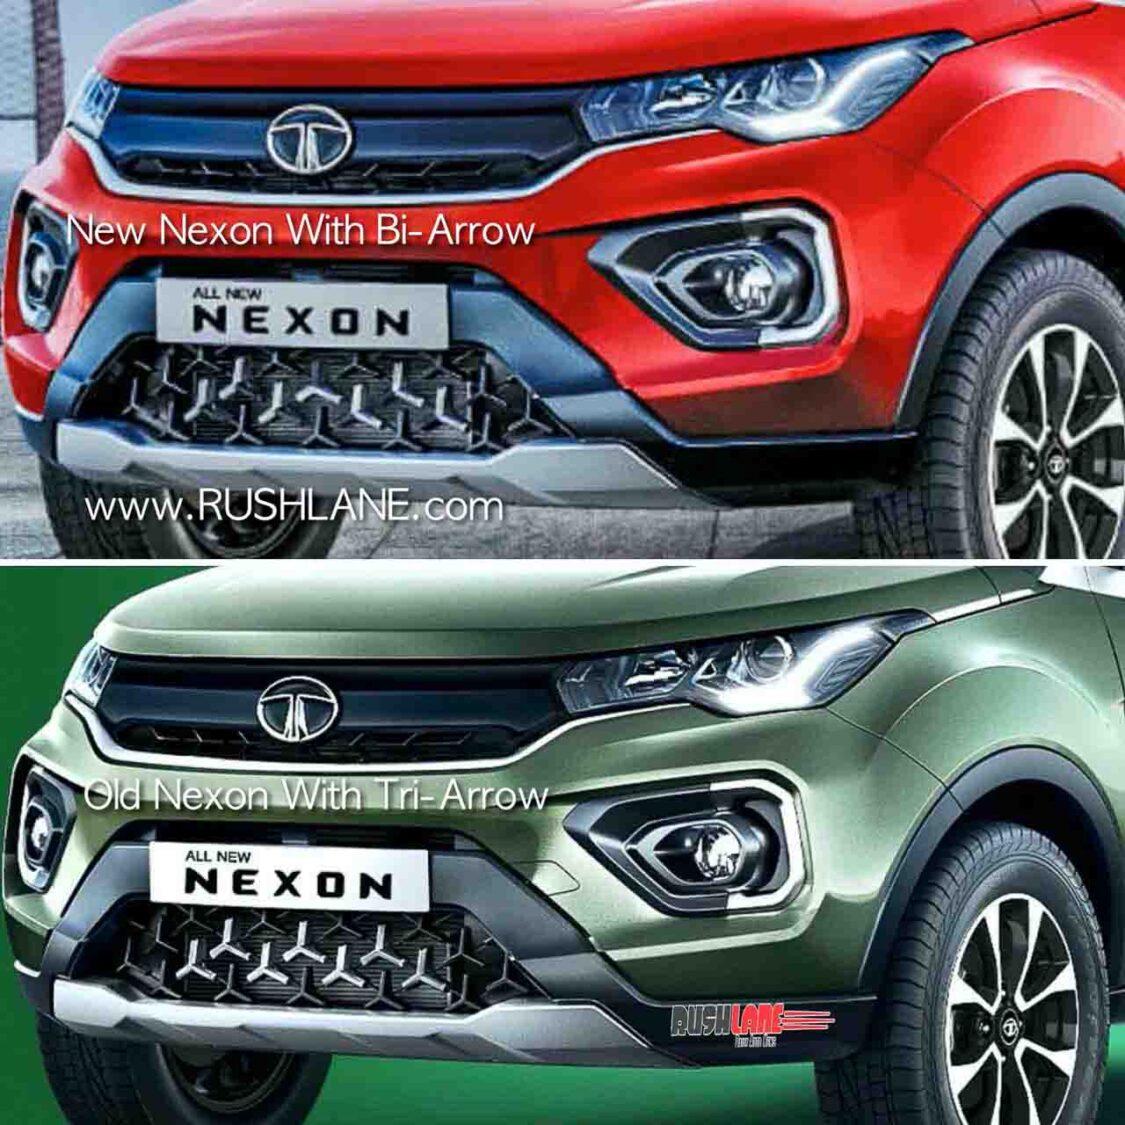 Tata Nexon Bi-Arrow Grille Design